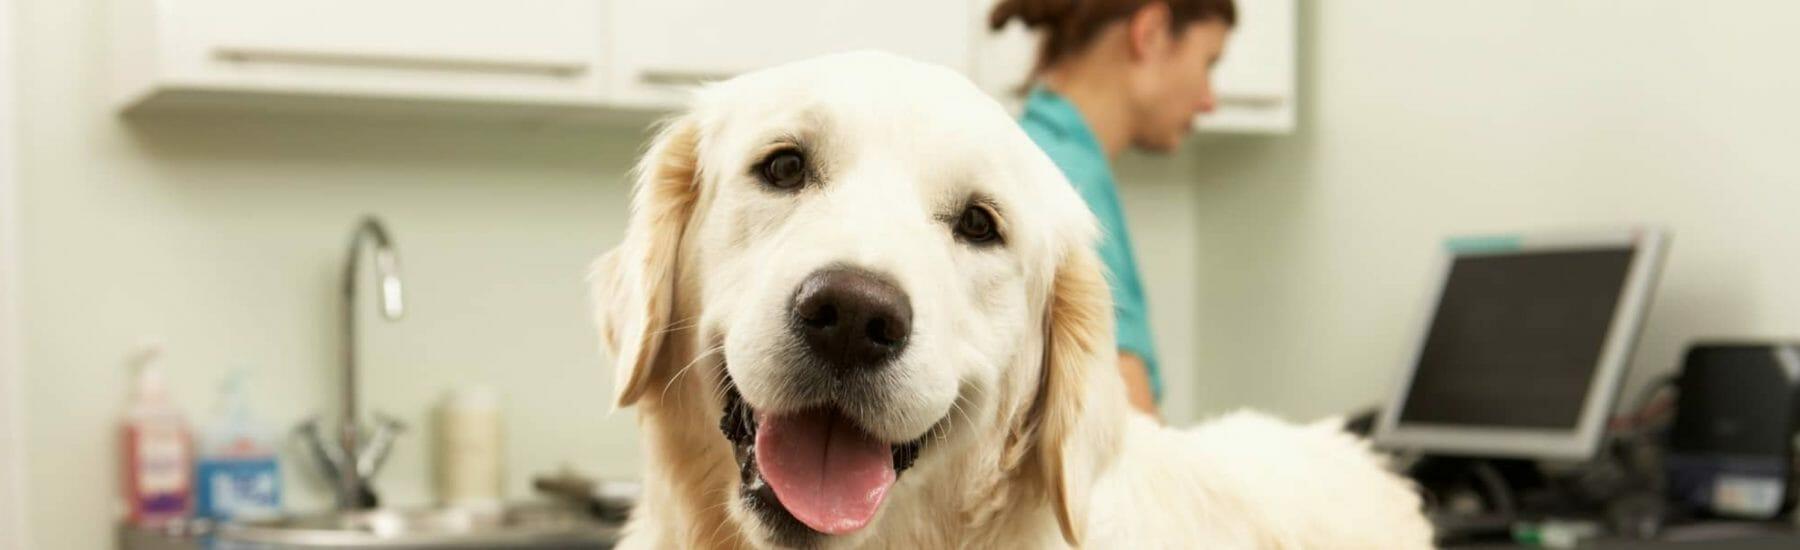 Veterinary Diagnostics Services